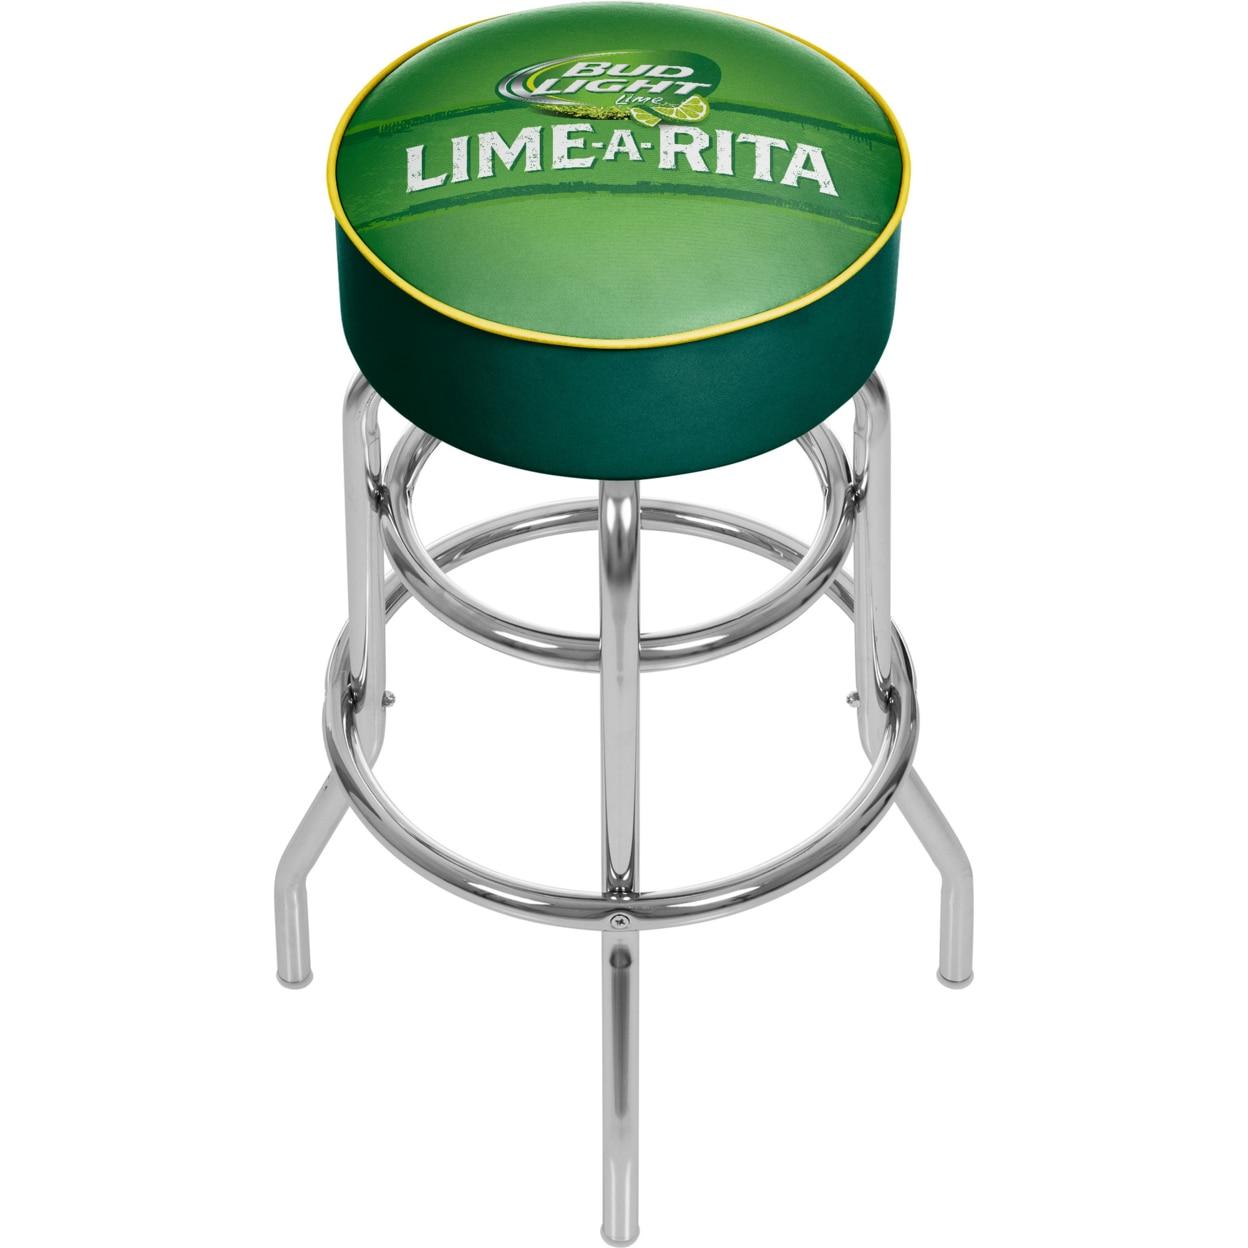 Bud Light Lime-A-Rita Padded Swivel Bar Stool 30 Inches High 30 Inches High sti7162 bud sti7162 bbud